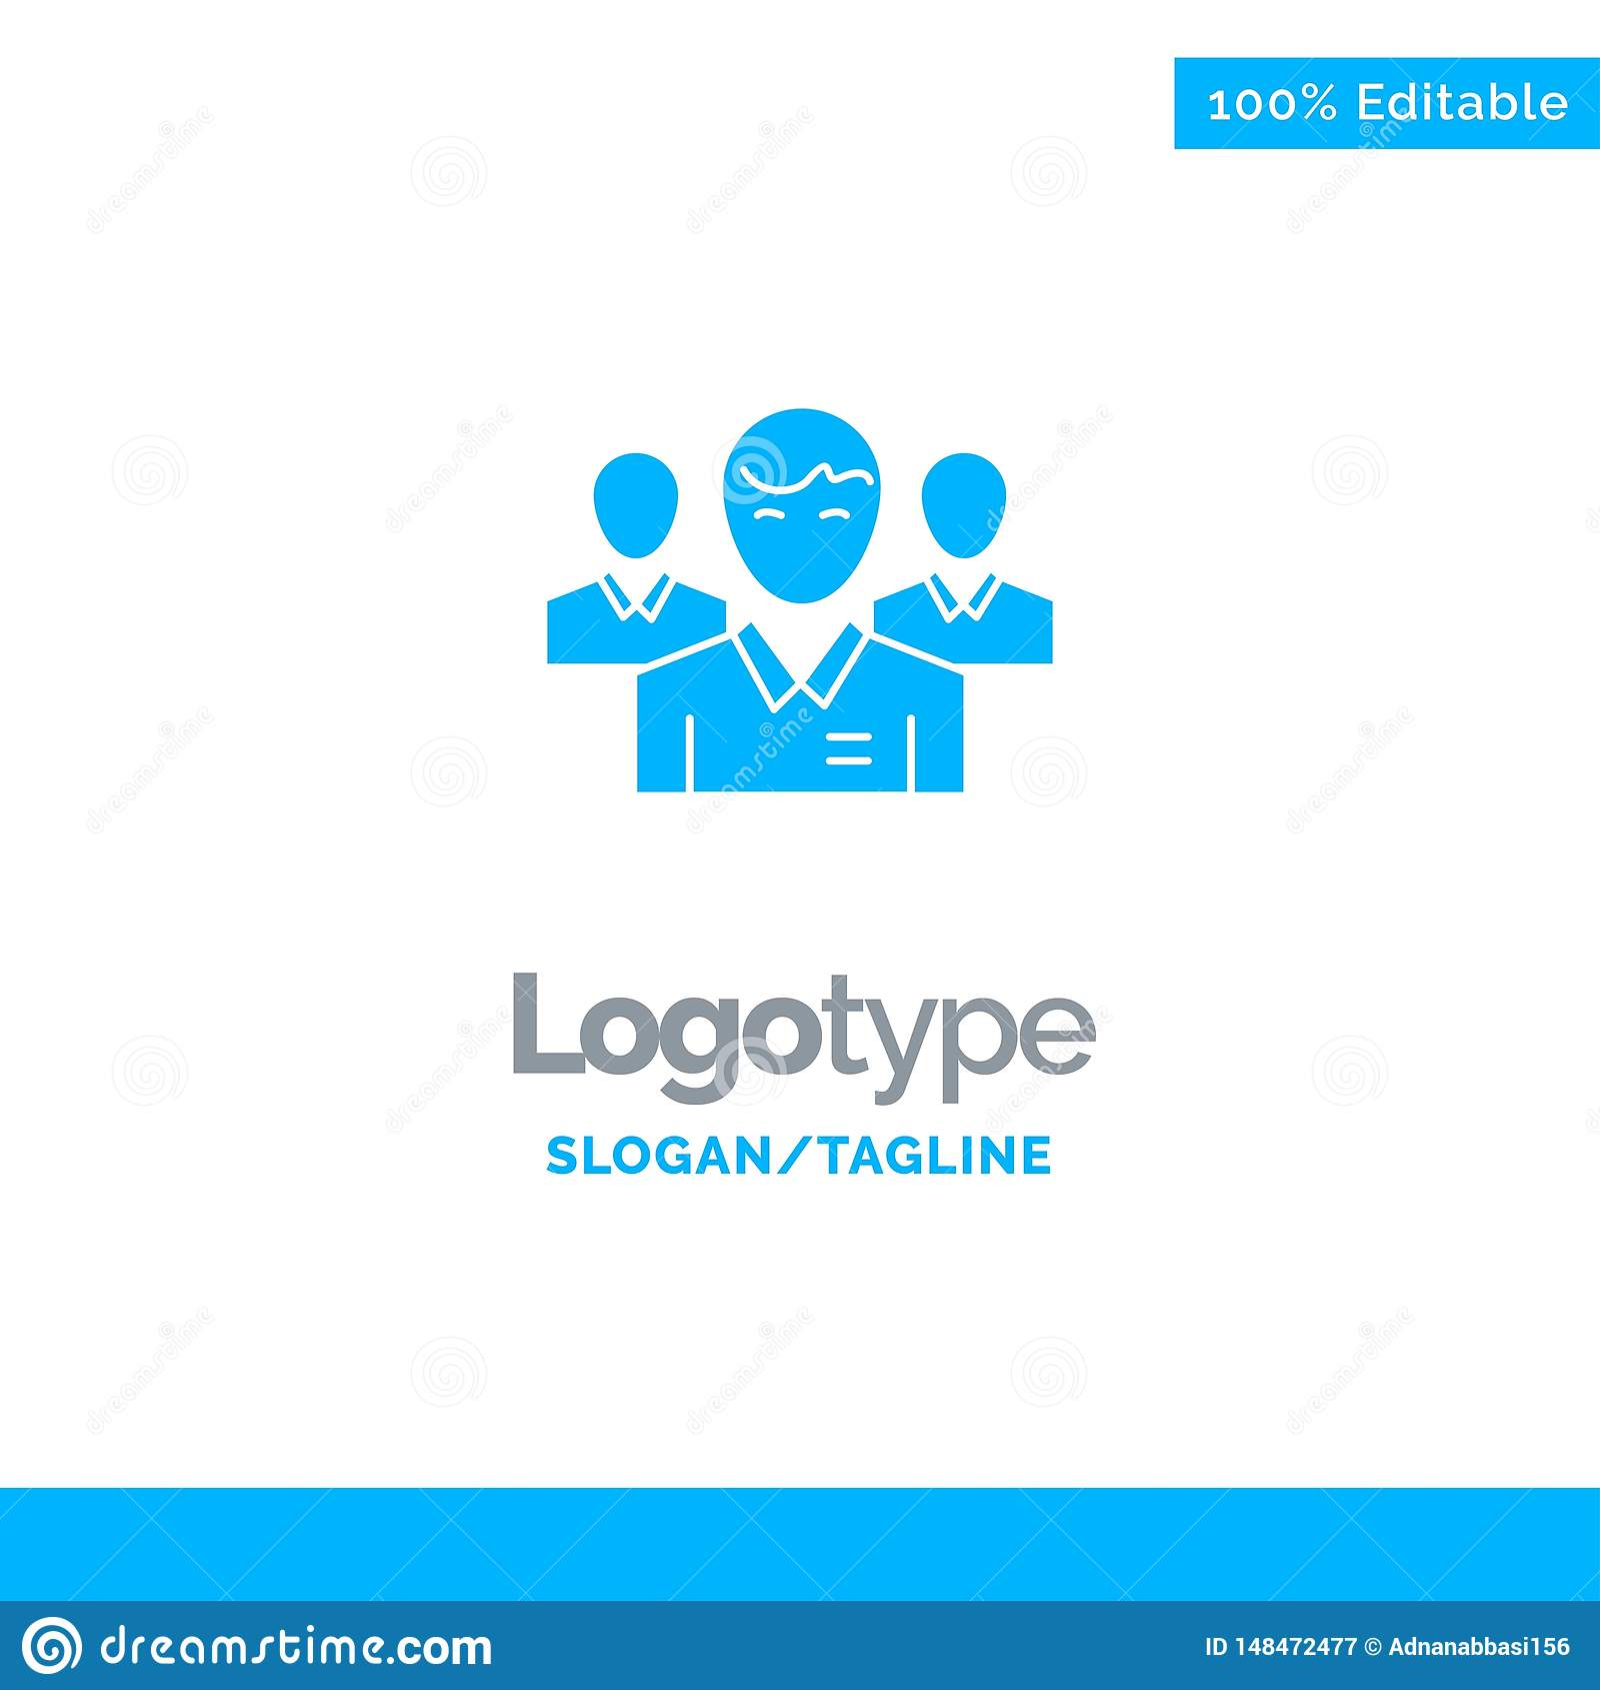 Lag affär, Ceo, ledare, ledare, ledarskap, person blåa fasta Logo Template St?lle f?r Tagline